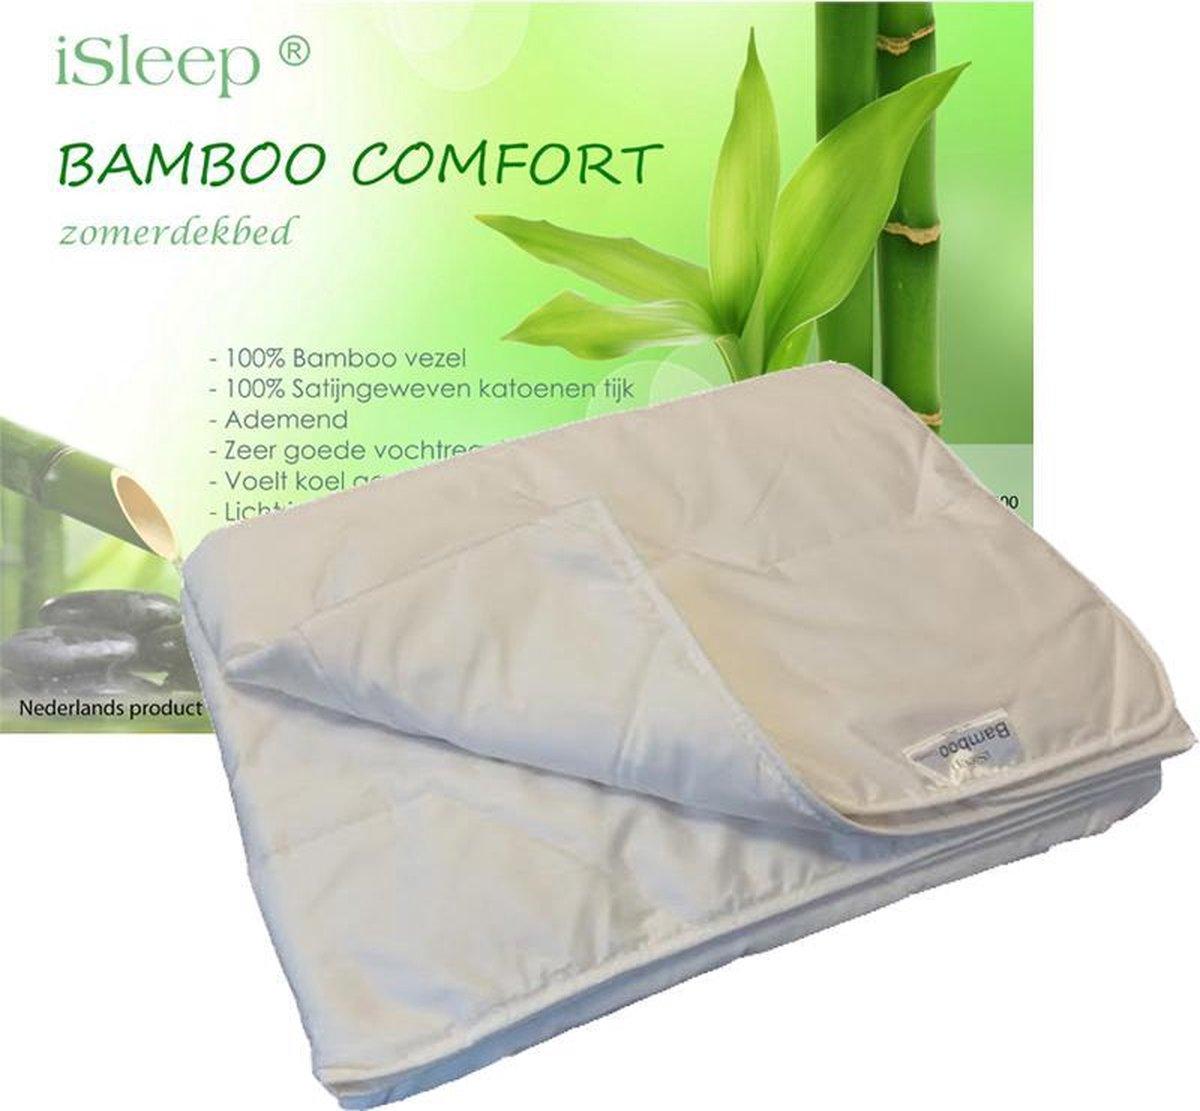 Dekbed Zomer Bamboo Comfort - 100% Bamboe - Litsjumeaux XL - 260x220 cm - Wit